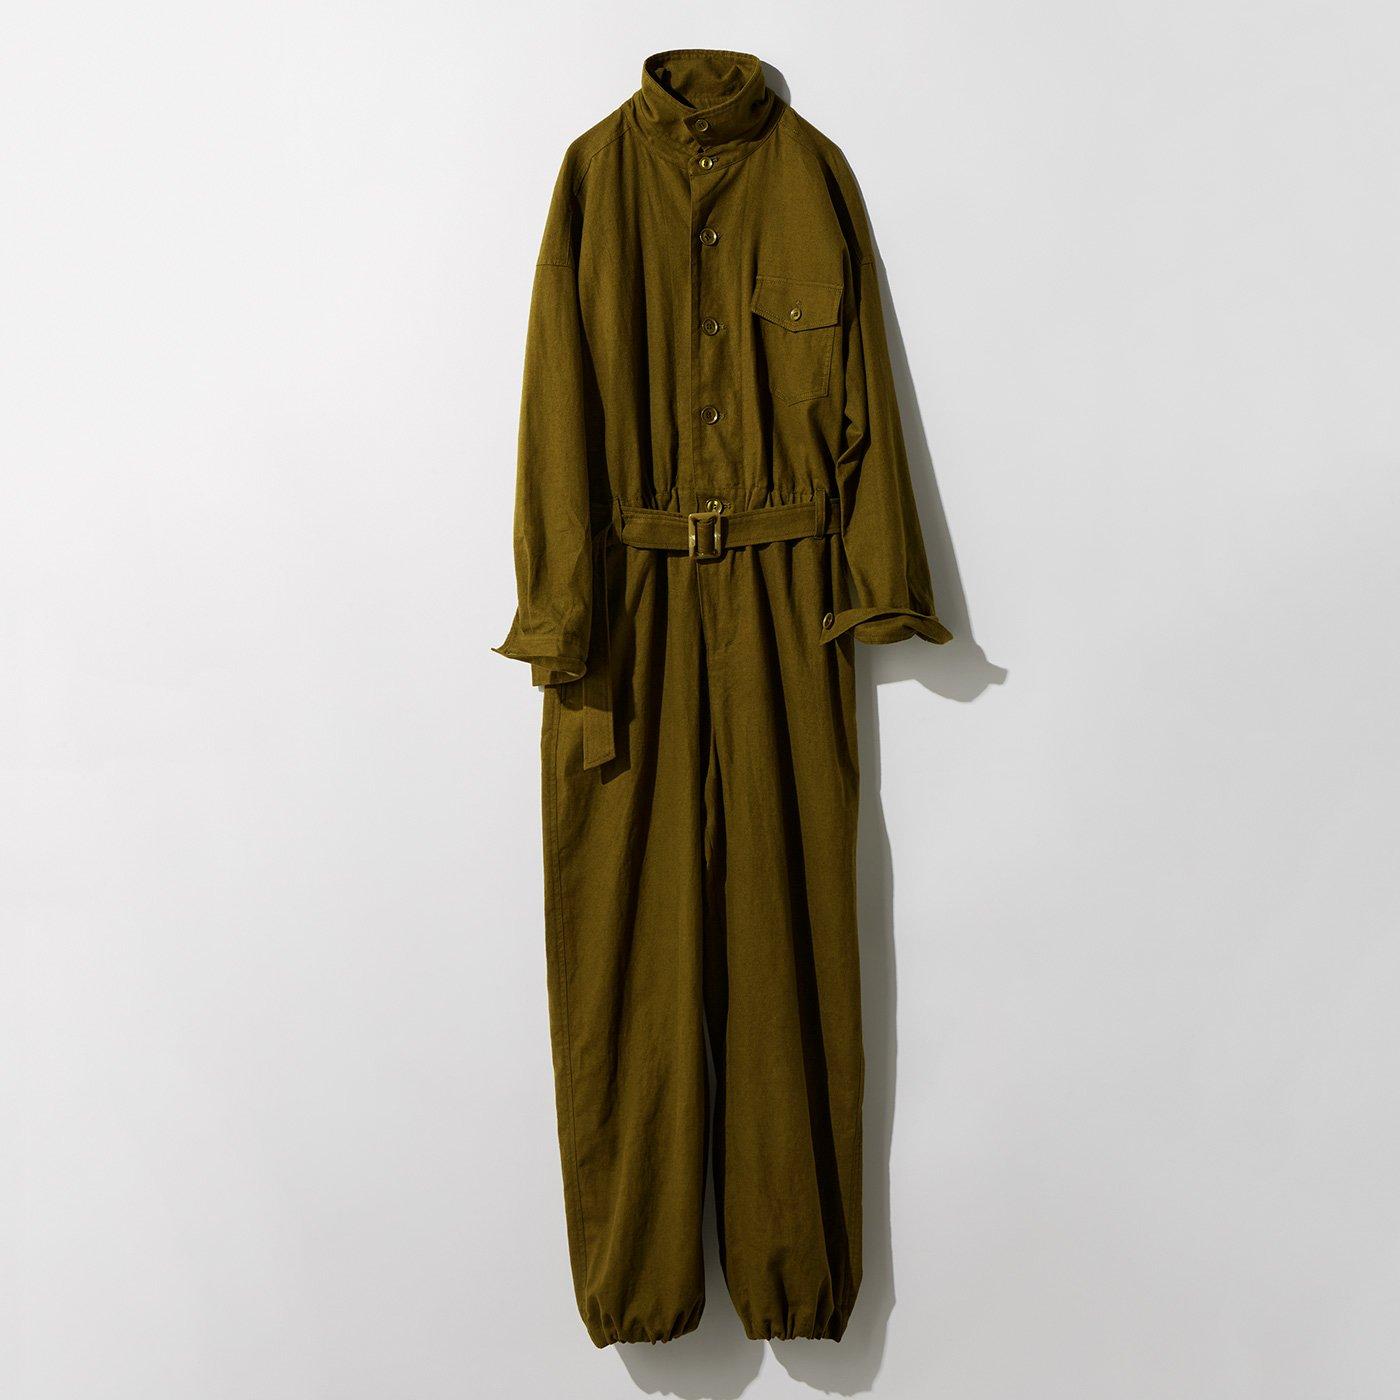 MEDE19F 麻混起毛素材のジャンプスーツ〈オリーブ〉